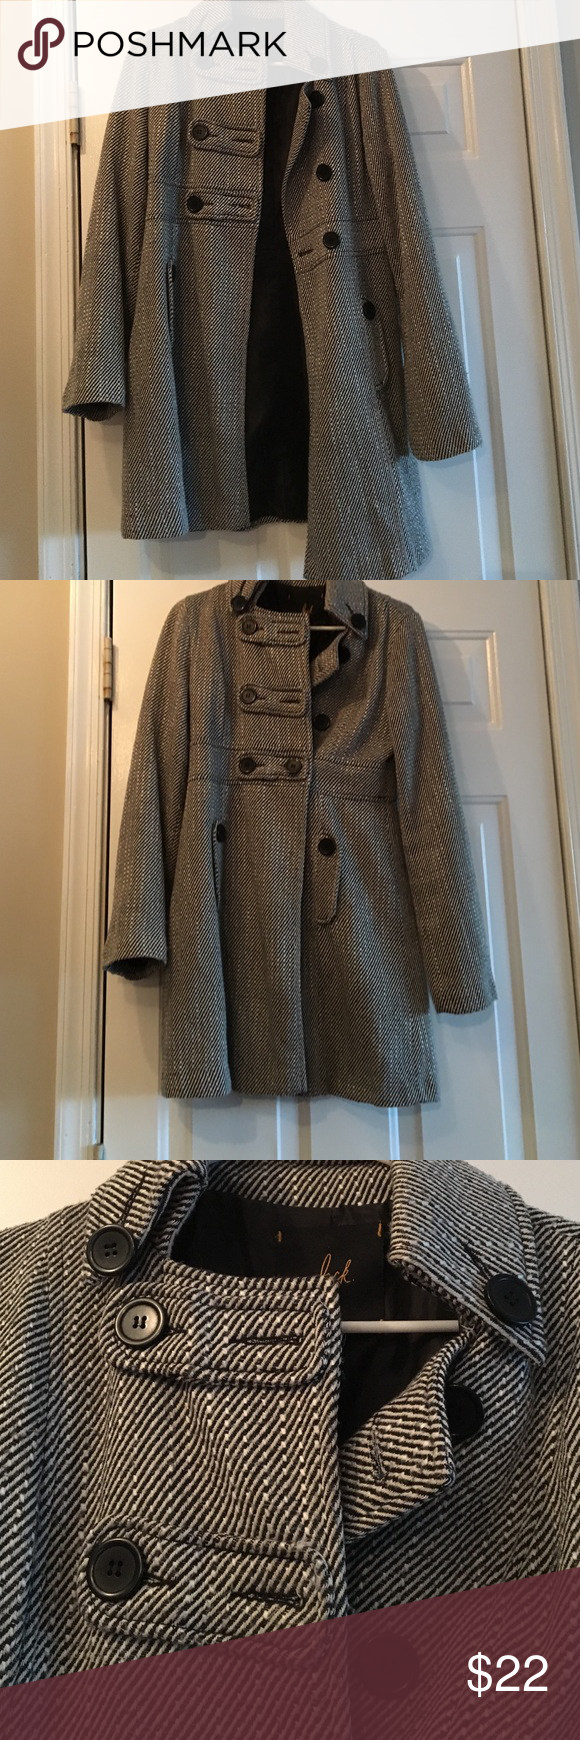 Jack by BB Dakota coat Adorable dress coat Jackets & Coats